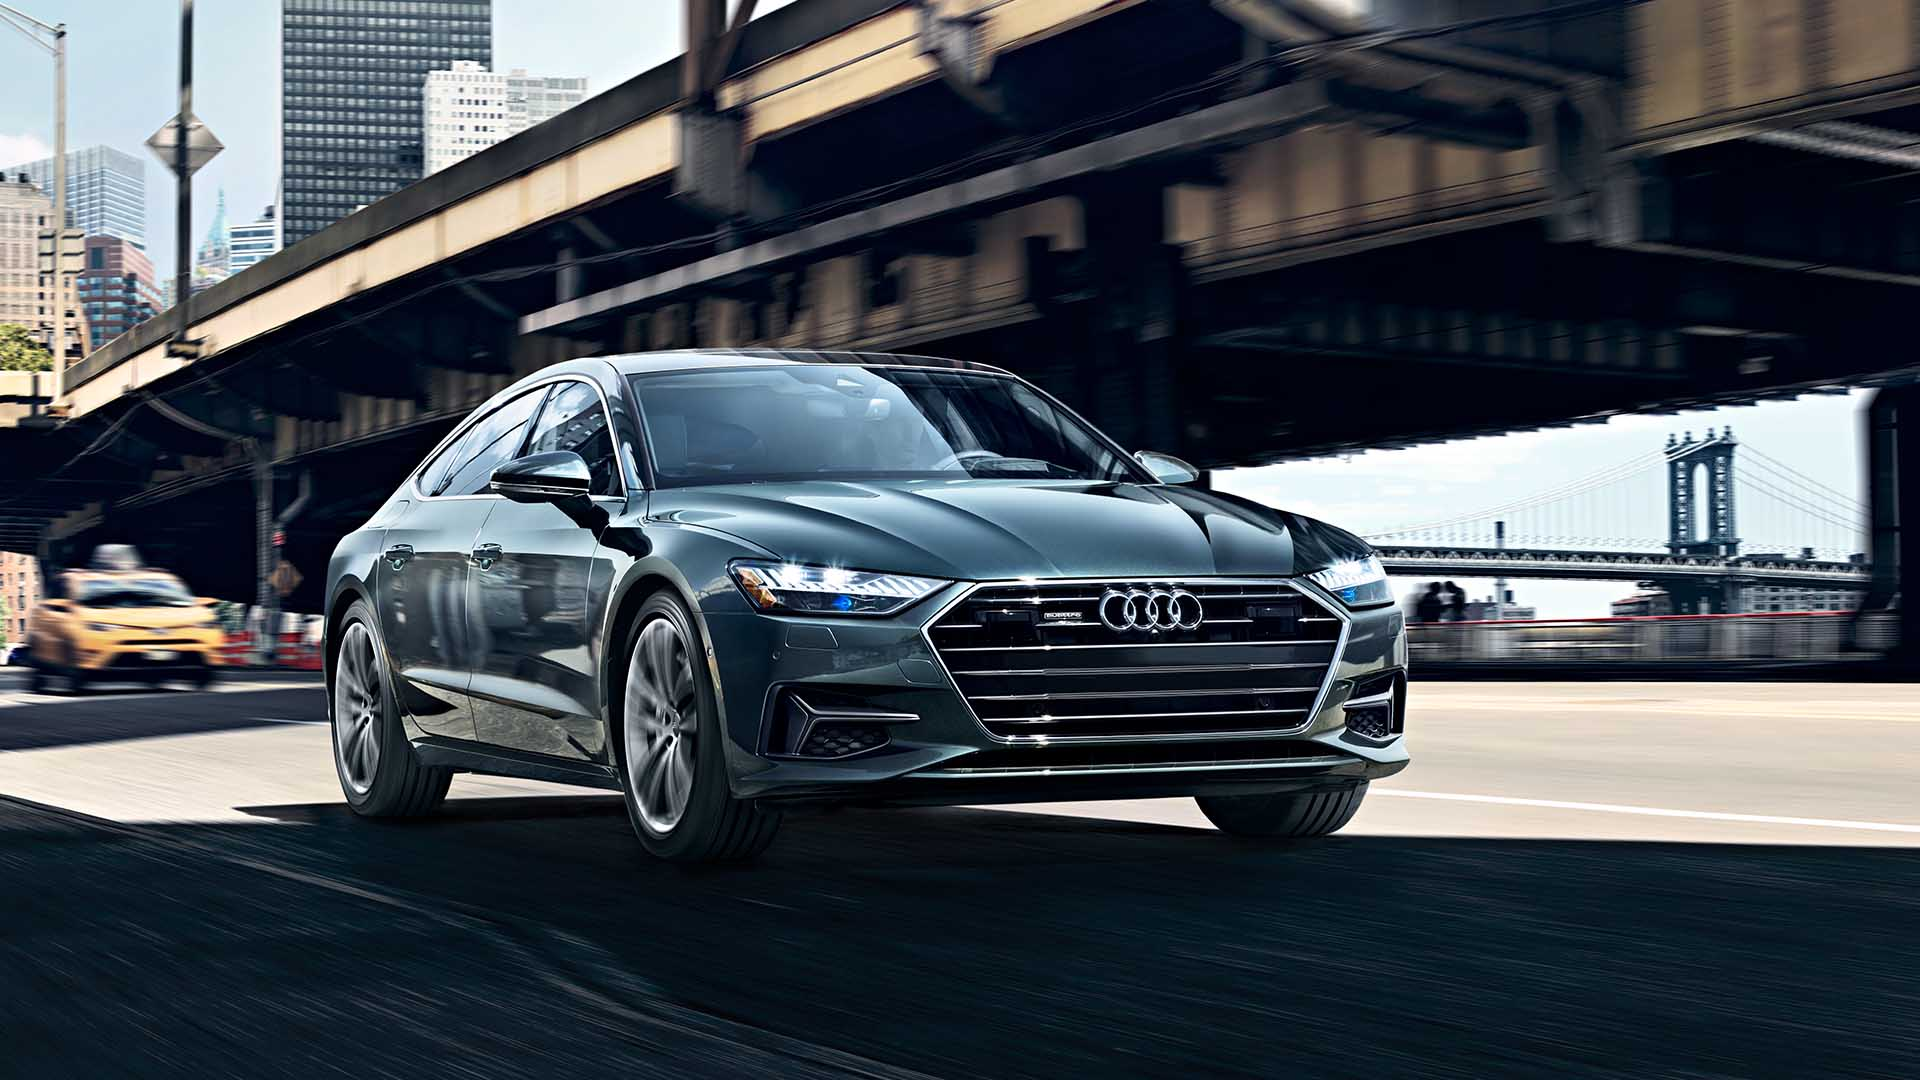 2020 Audi A7 - Luxury cars 2020